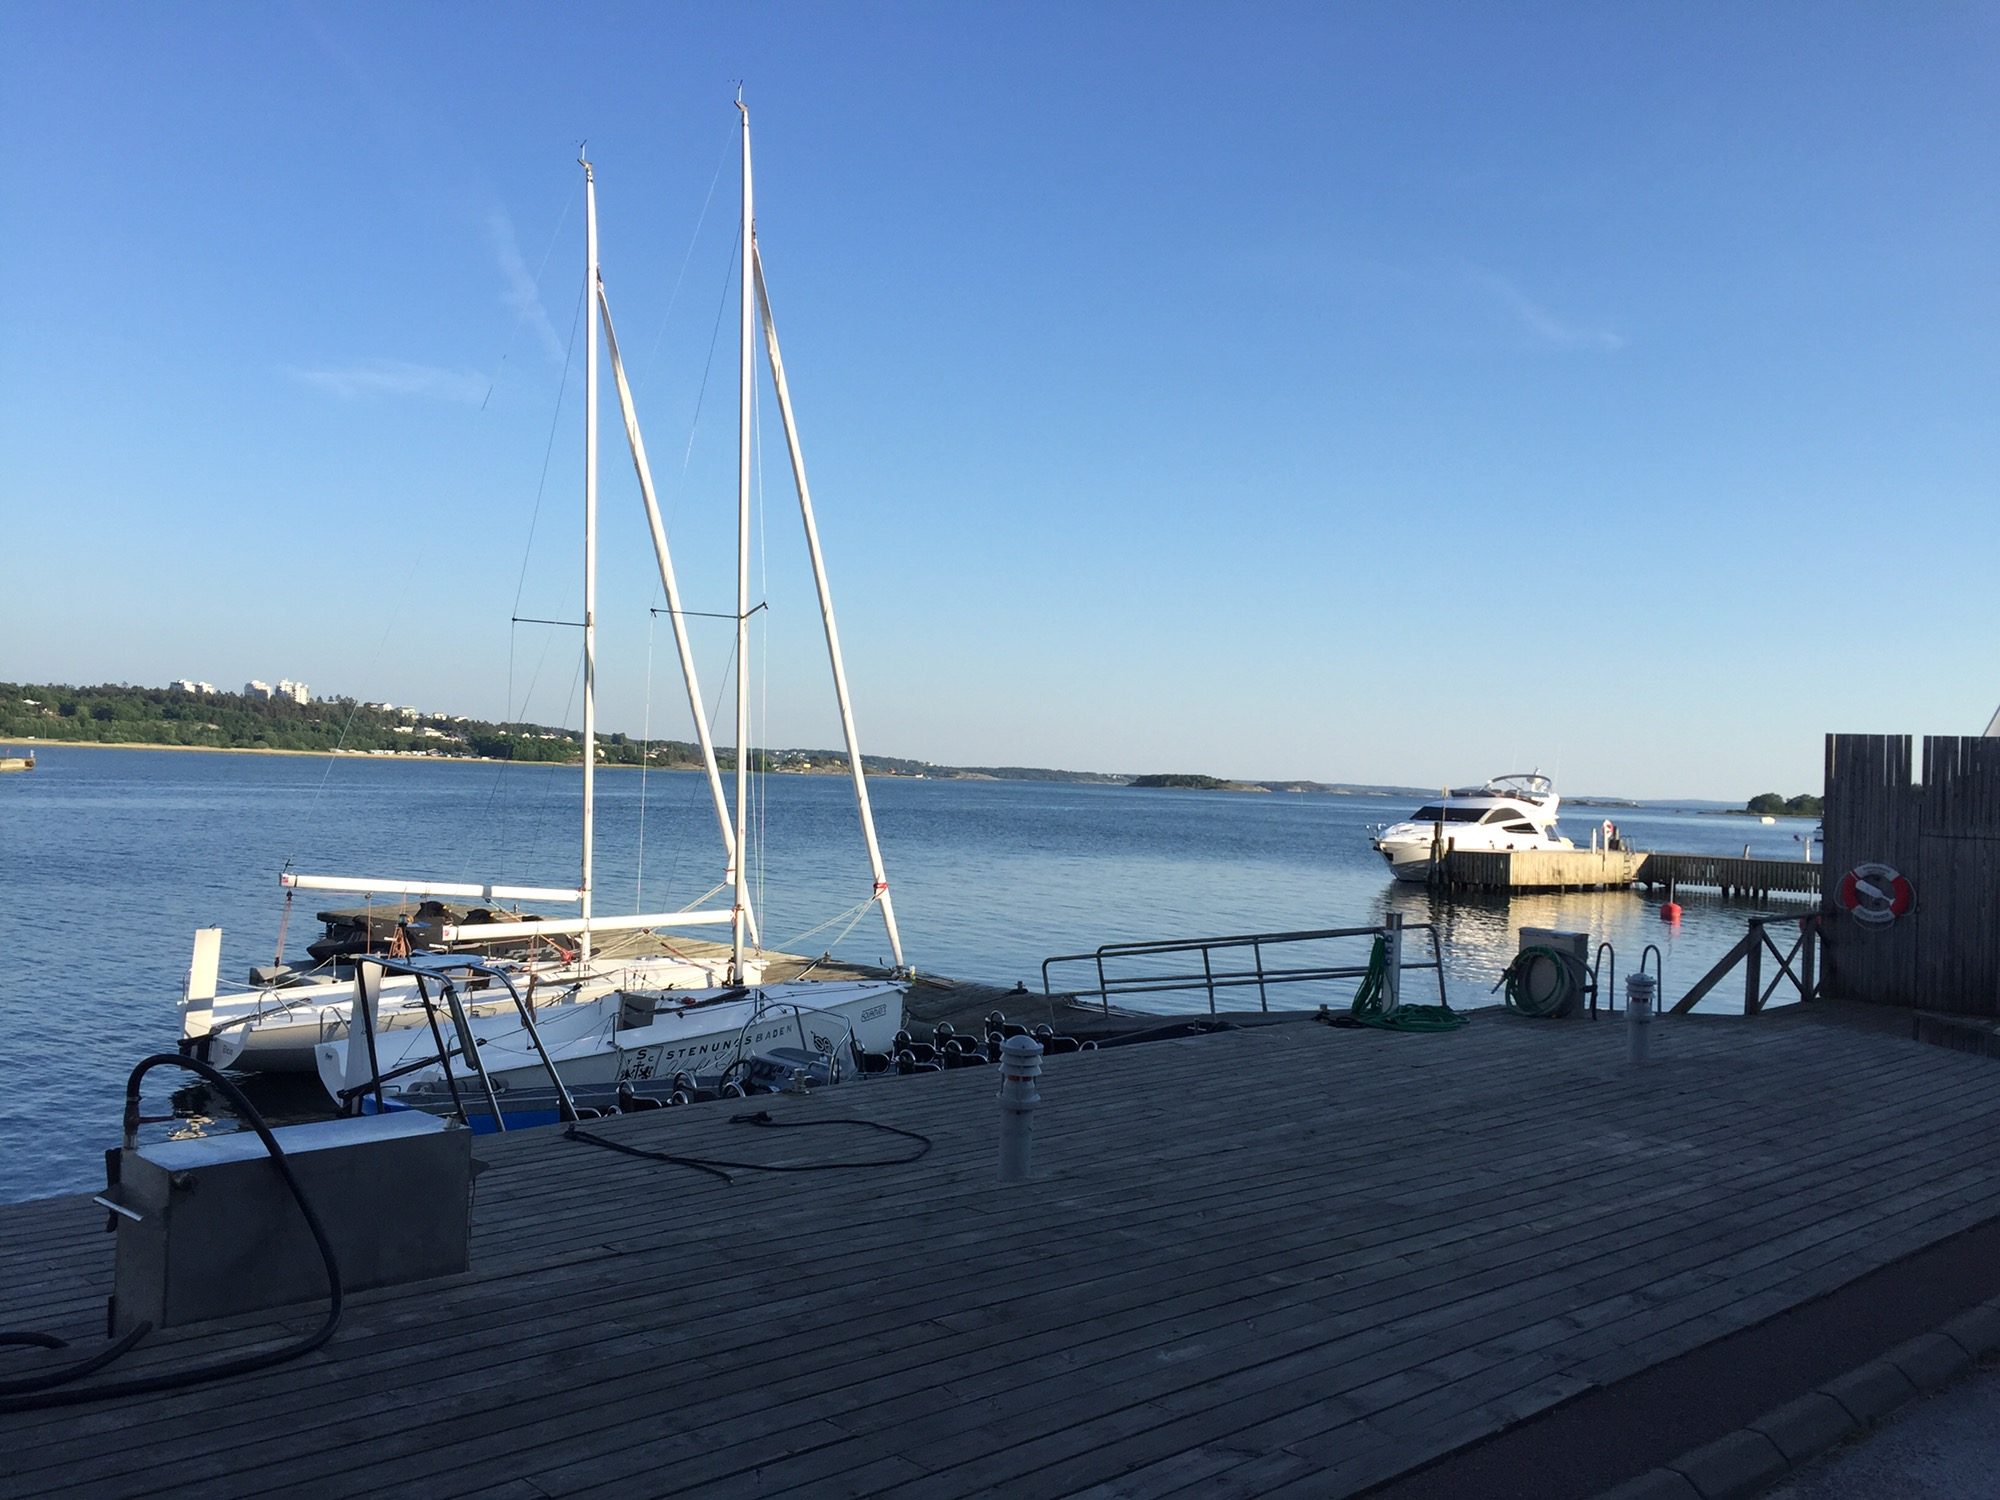 stenugnsbaden yacht club